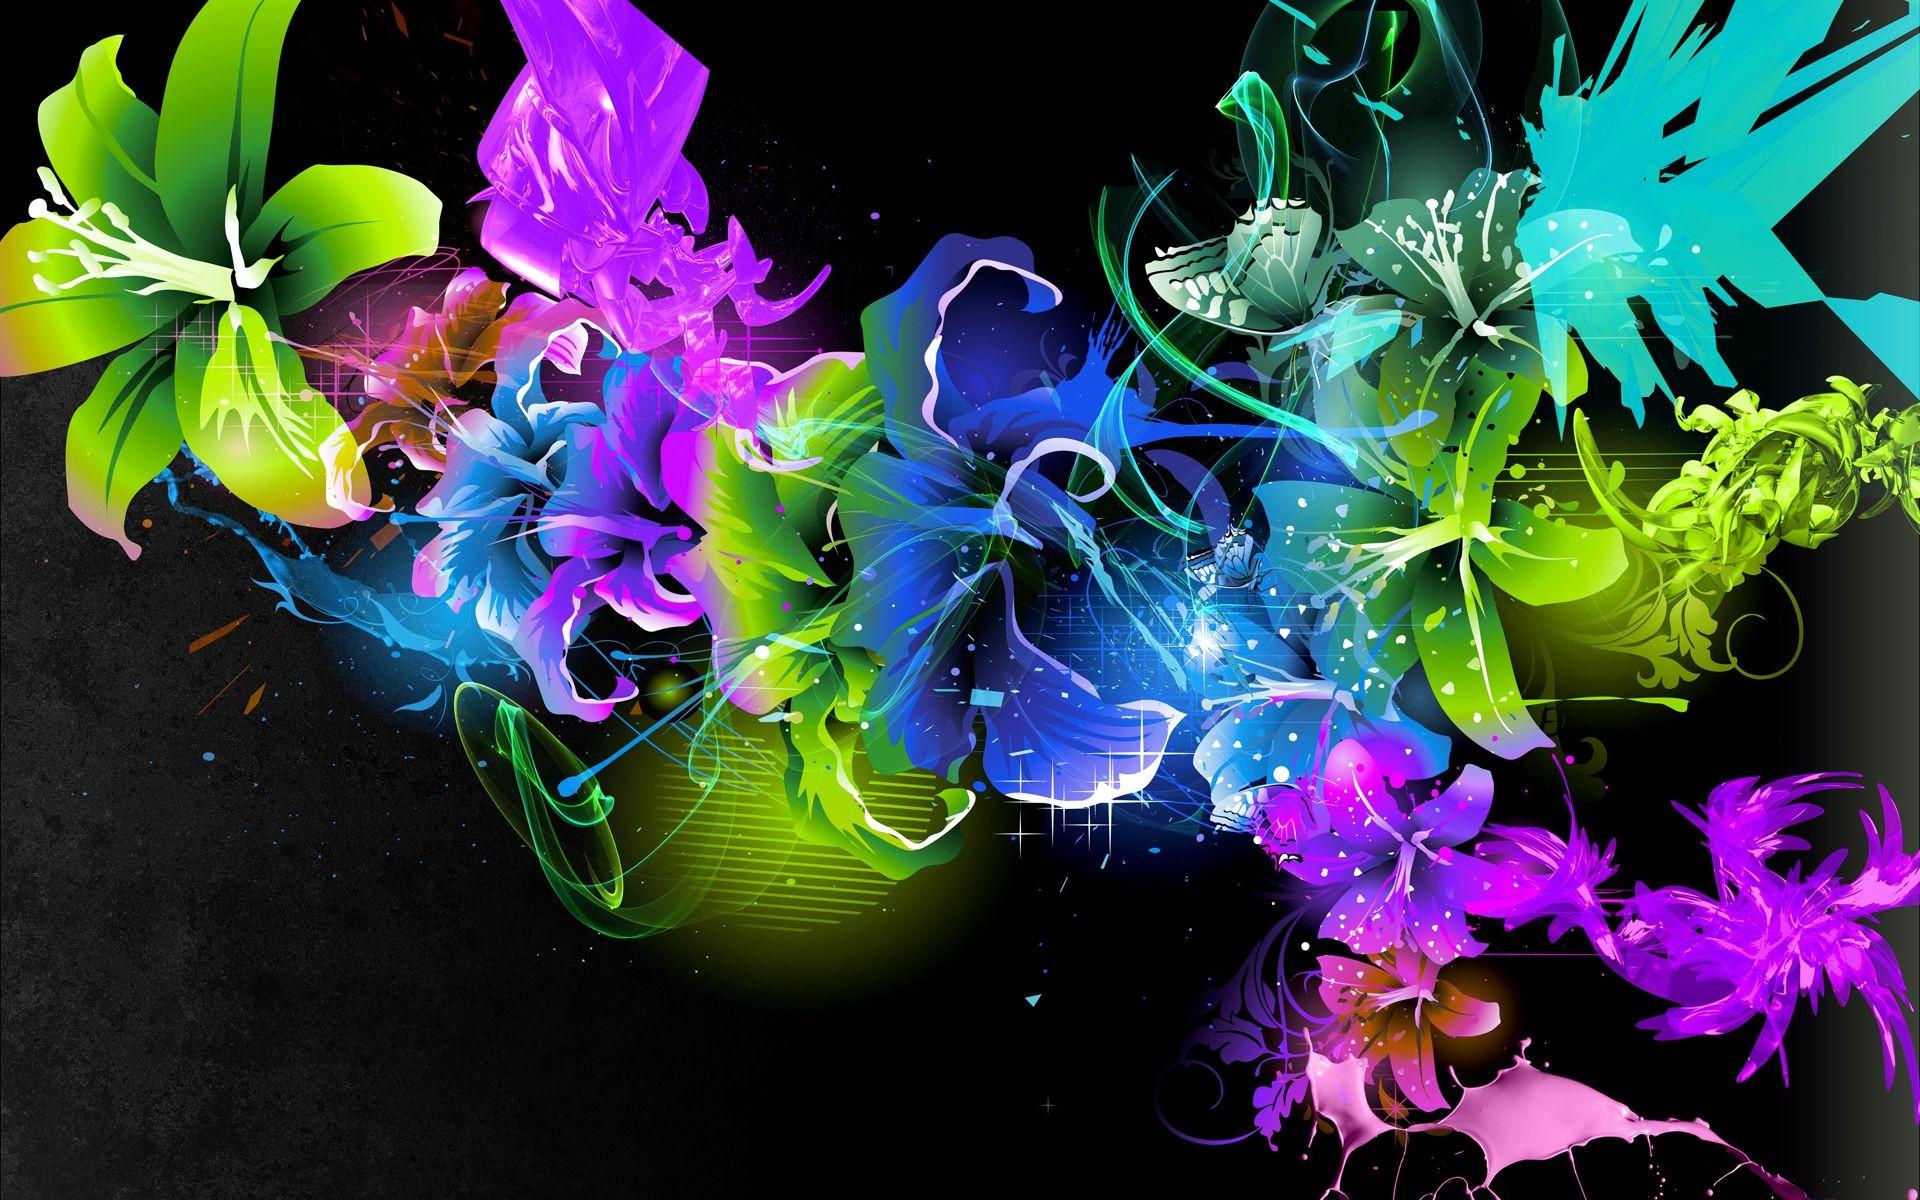 Abstract Color Art Wallpaper HD 1920x1200